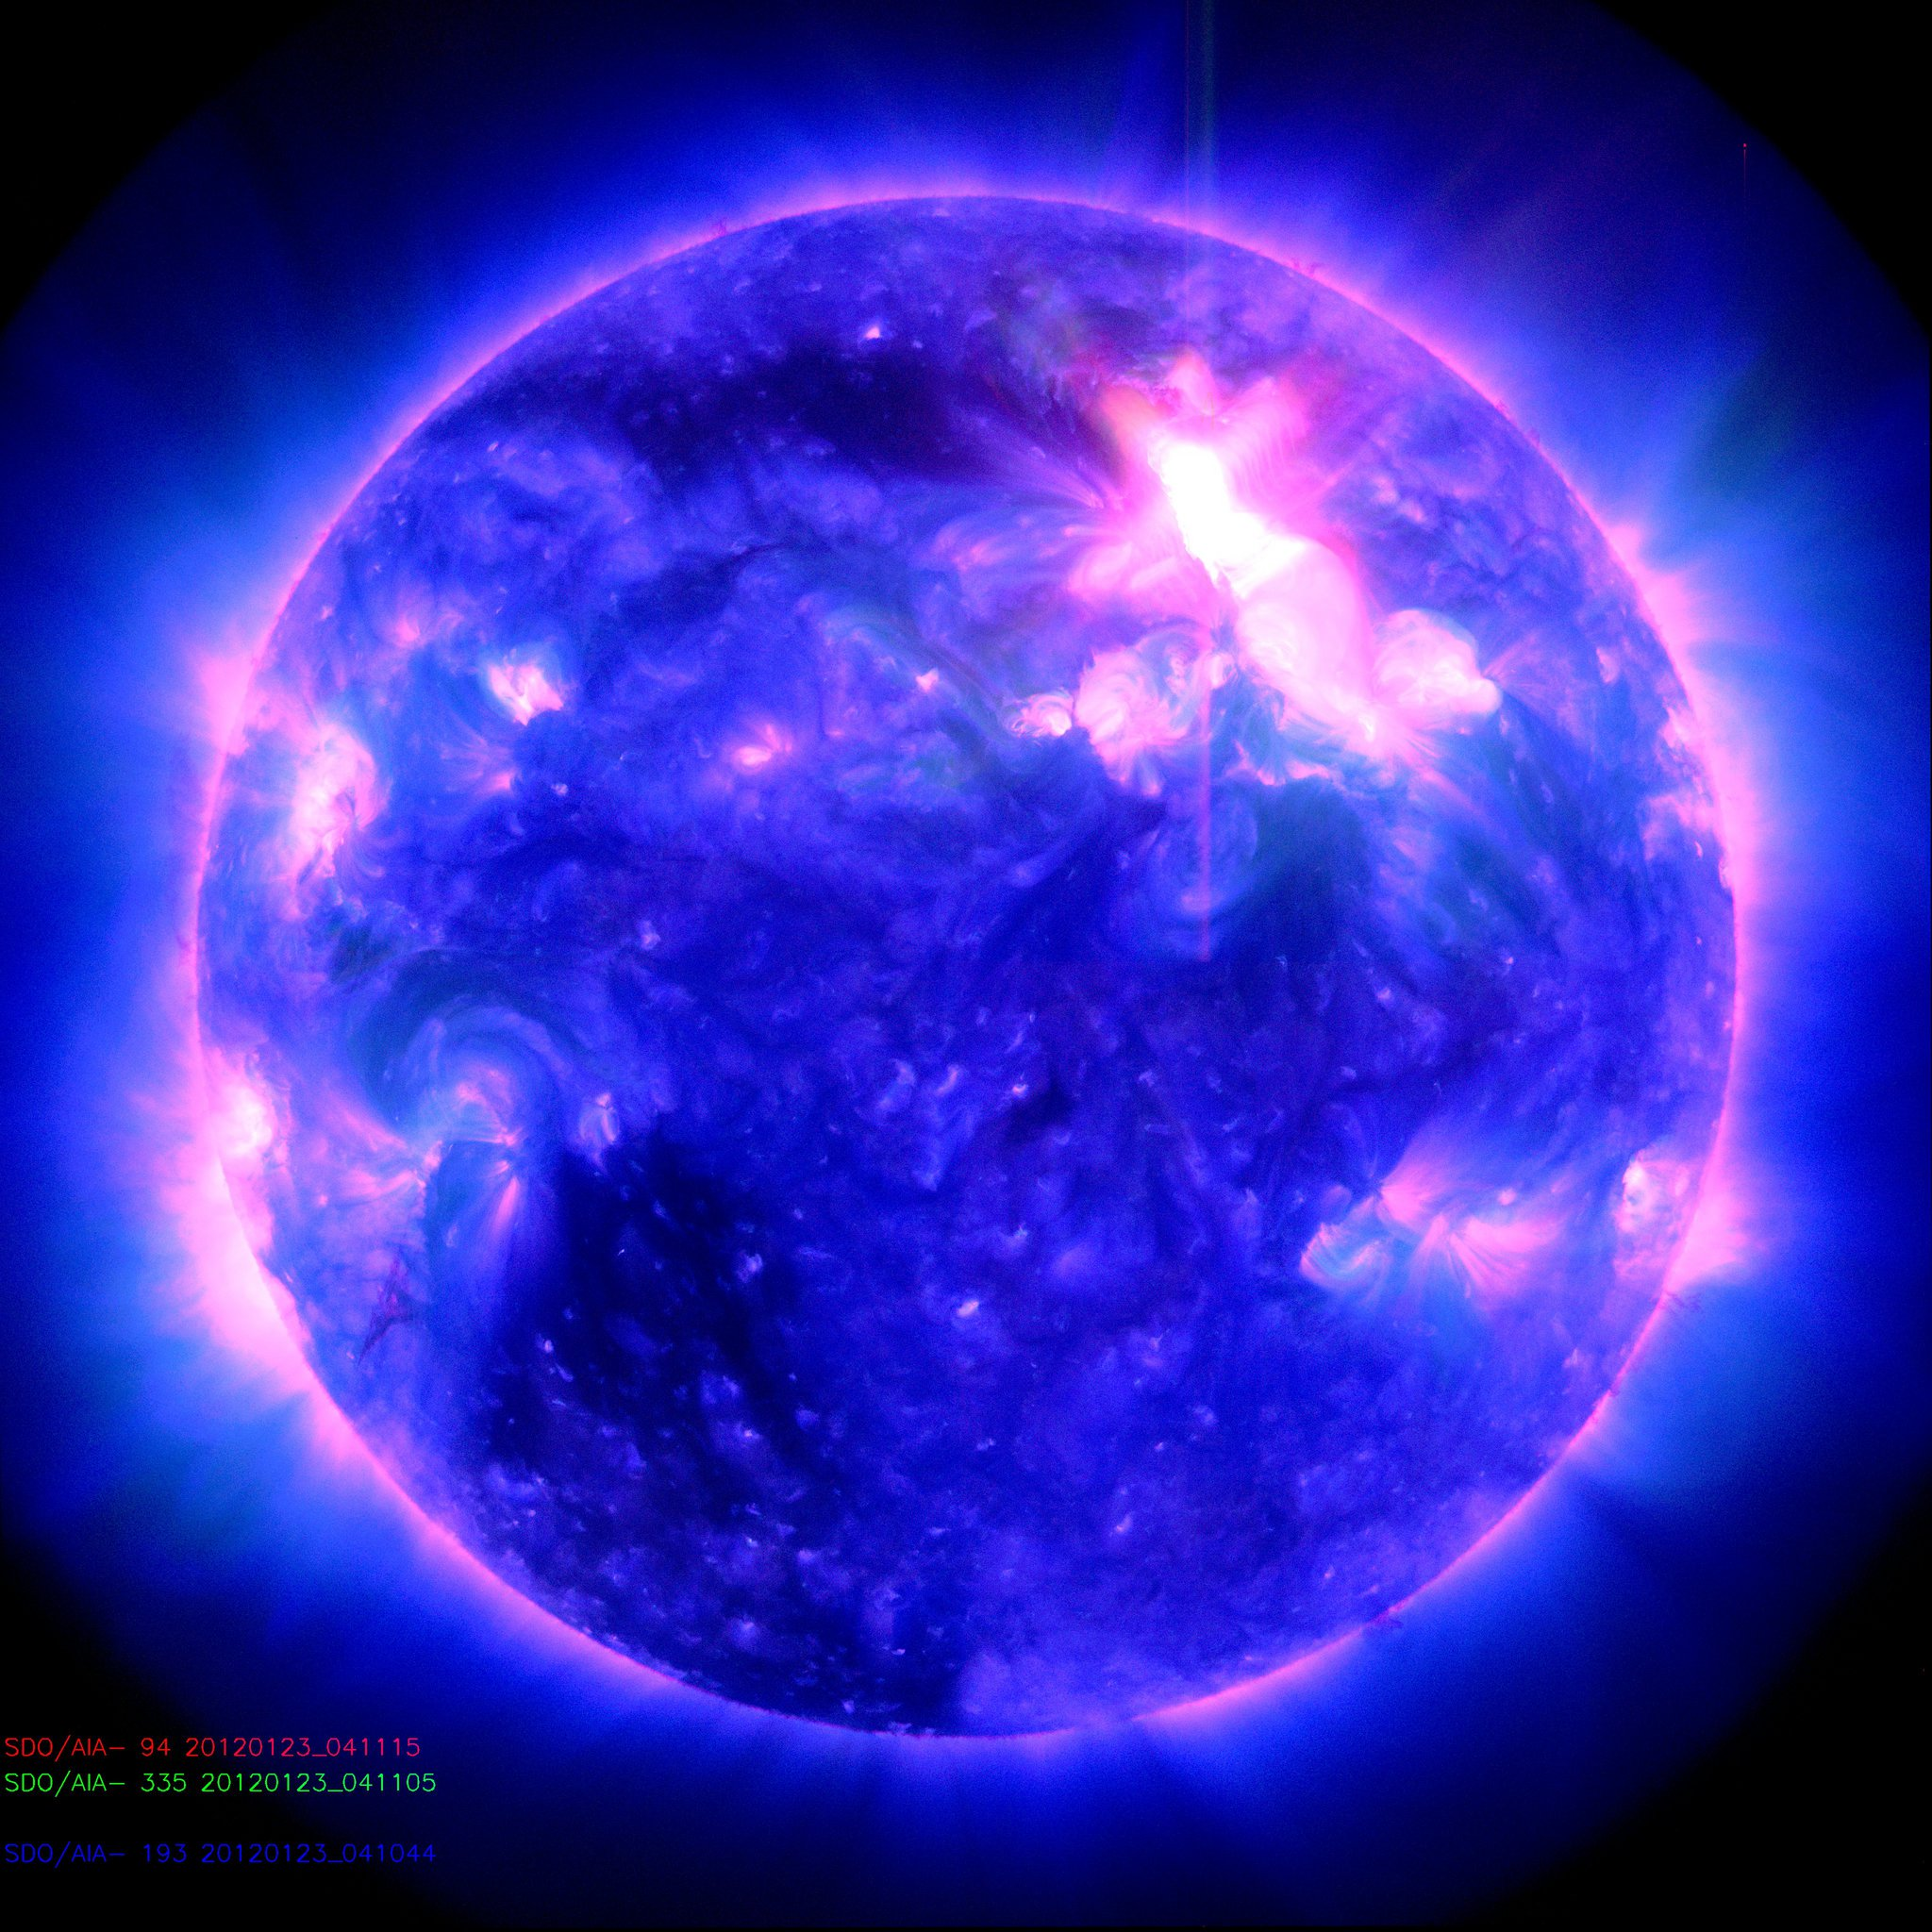 http://spaceweather.com/images2012/23jan12/m9.jpg?PHPSESSID=58ldi0l0c2c37dgn876h9lbk52